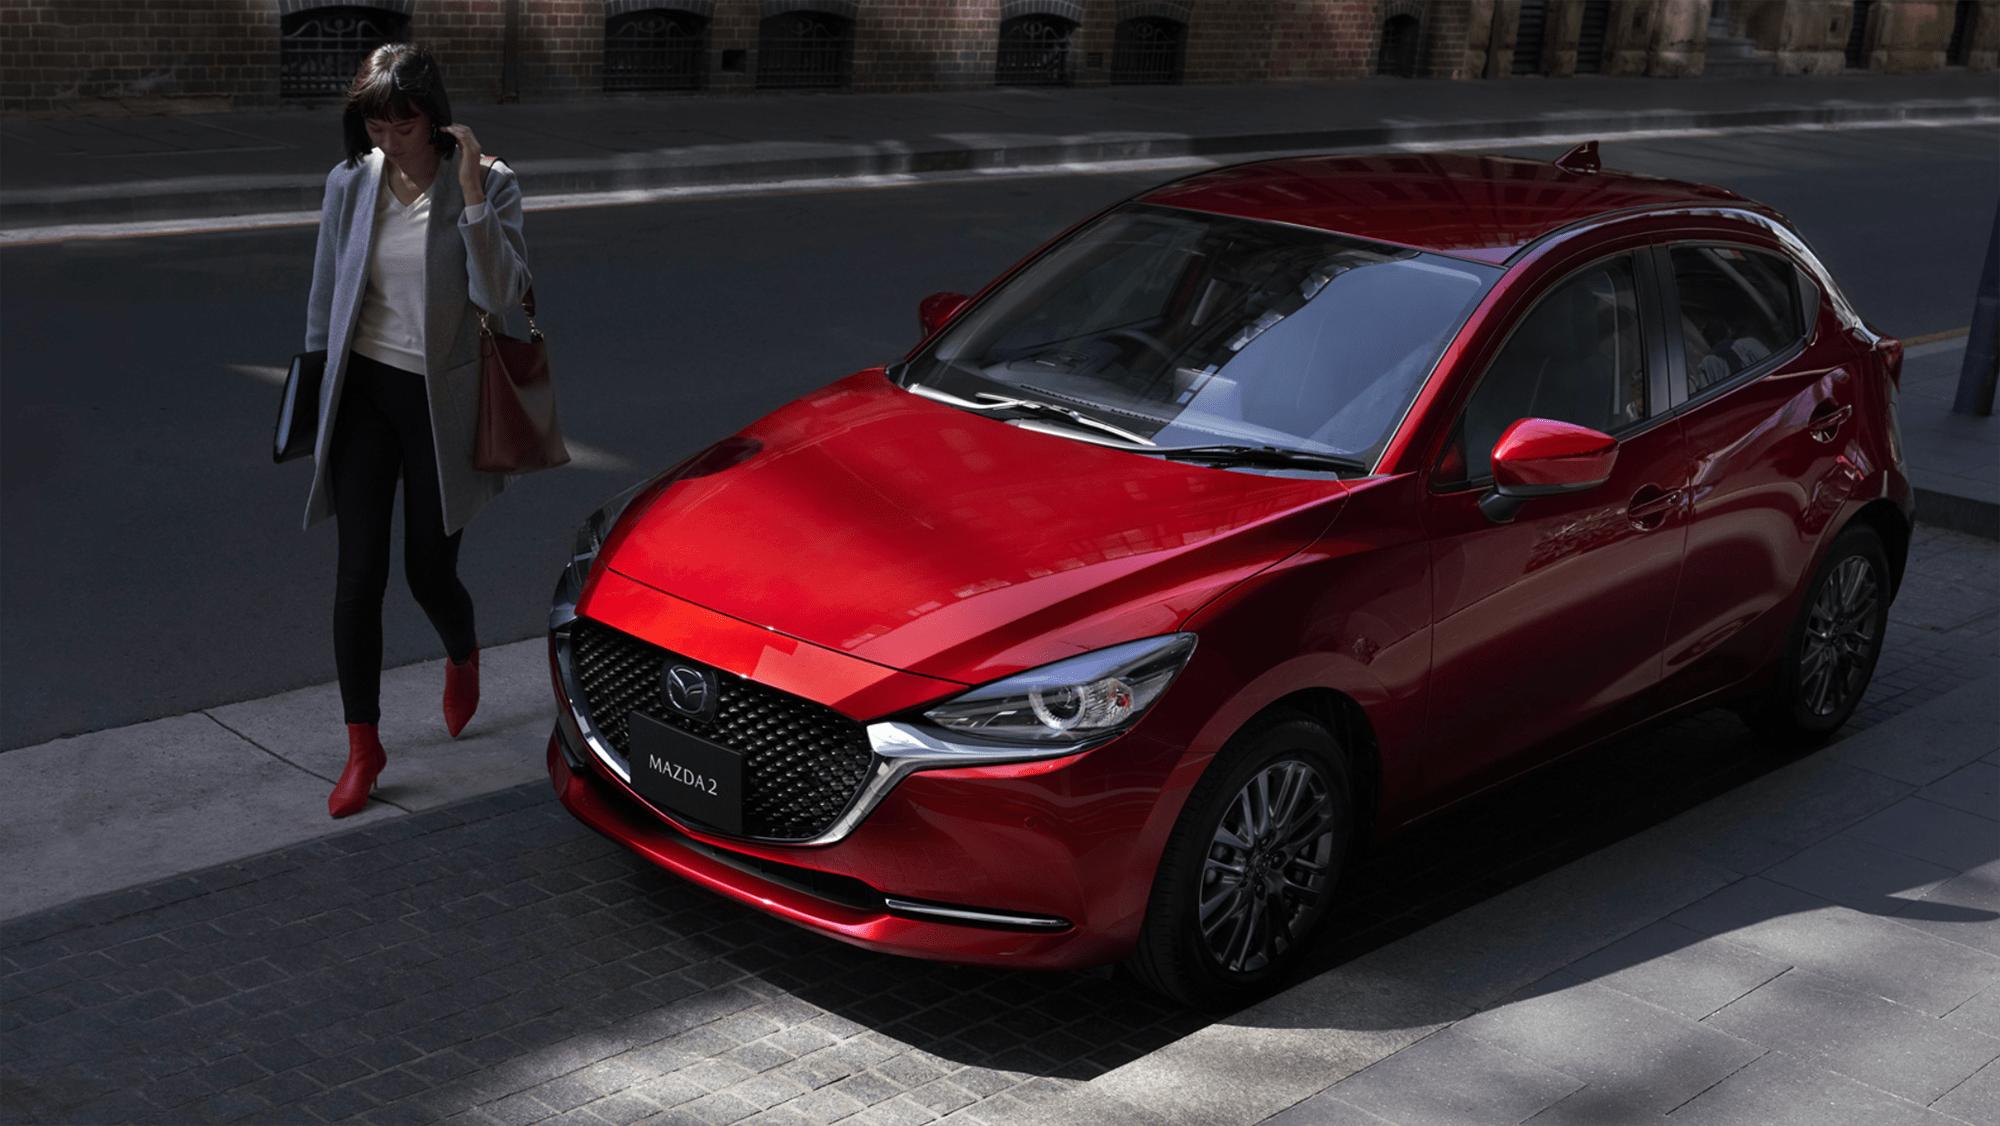 Kelebihan Mazda 2 2019 Sedan Murah Berkualitas